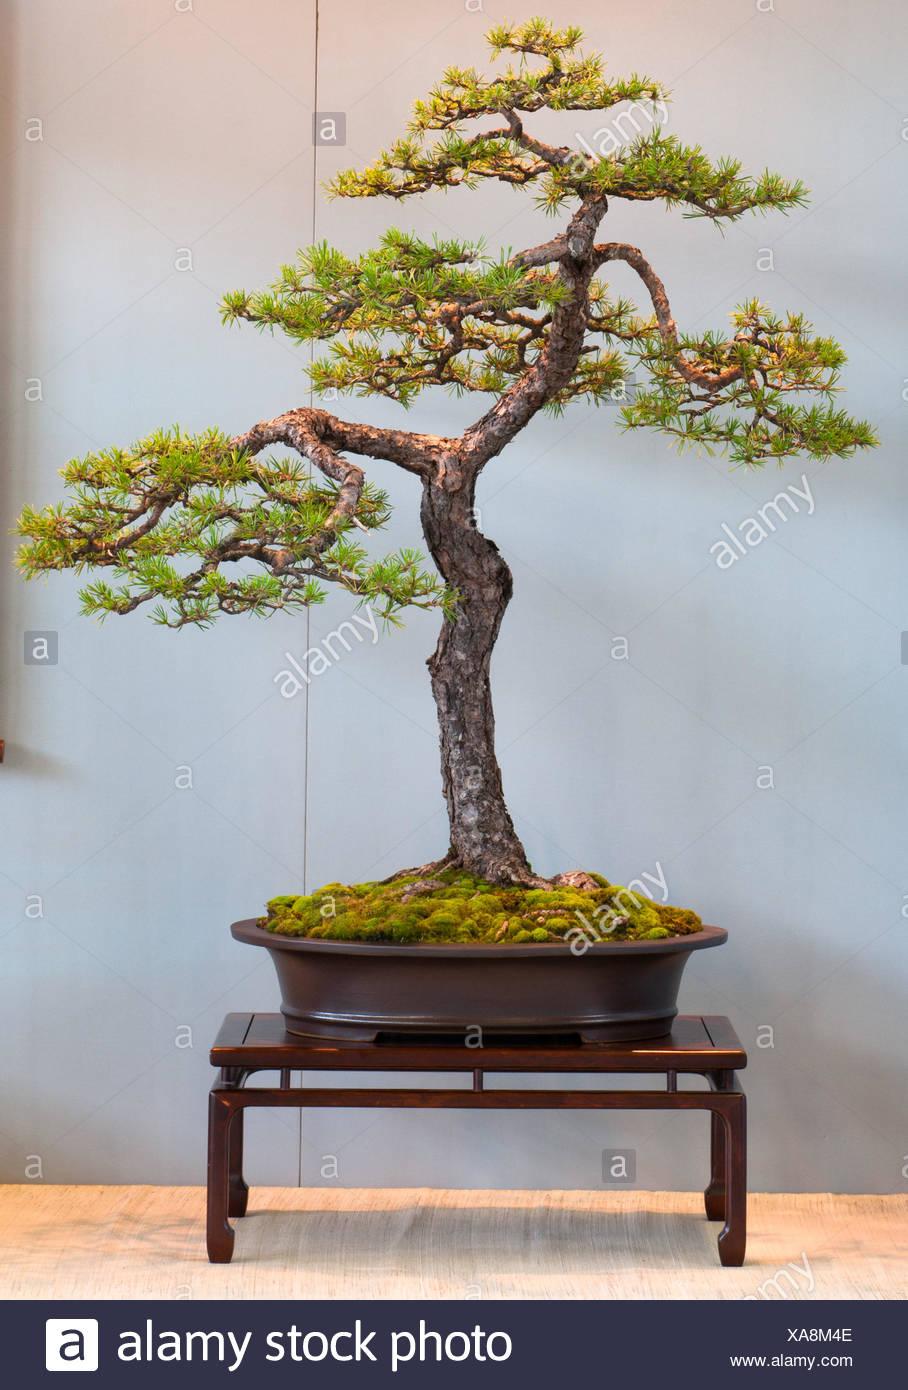 Scots Pine Bonsai Stock Photos & Scots Pine Bonsai Stock Images - Alamy